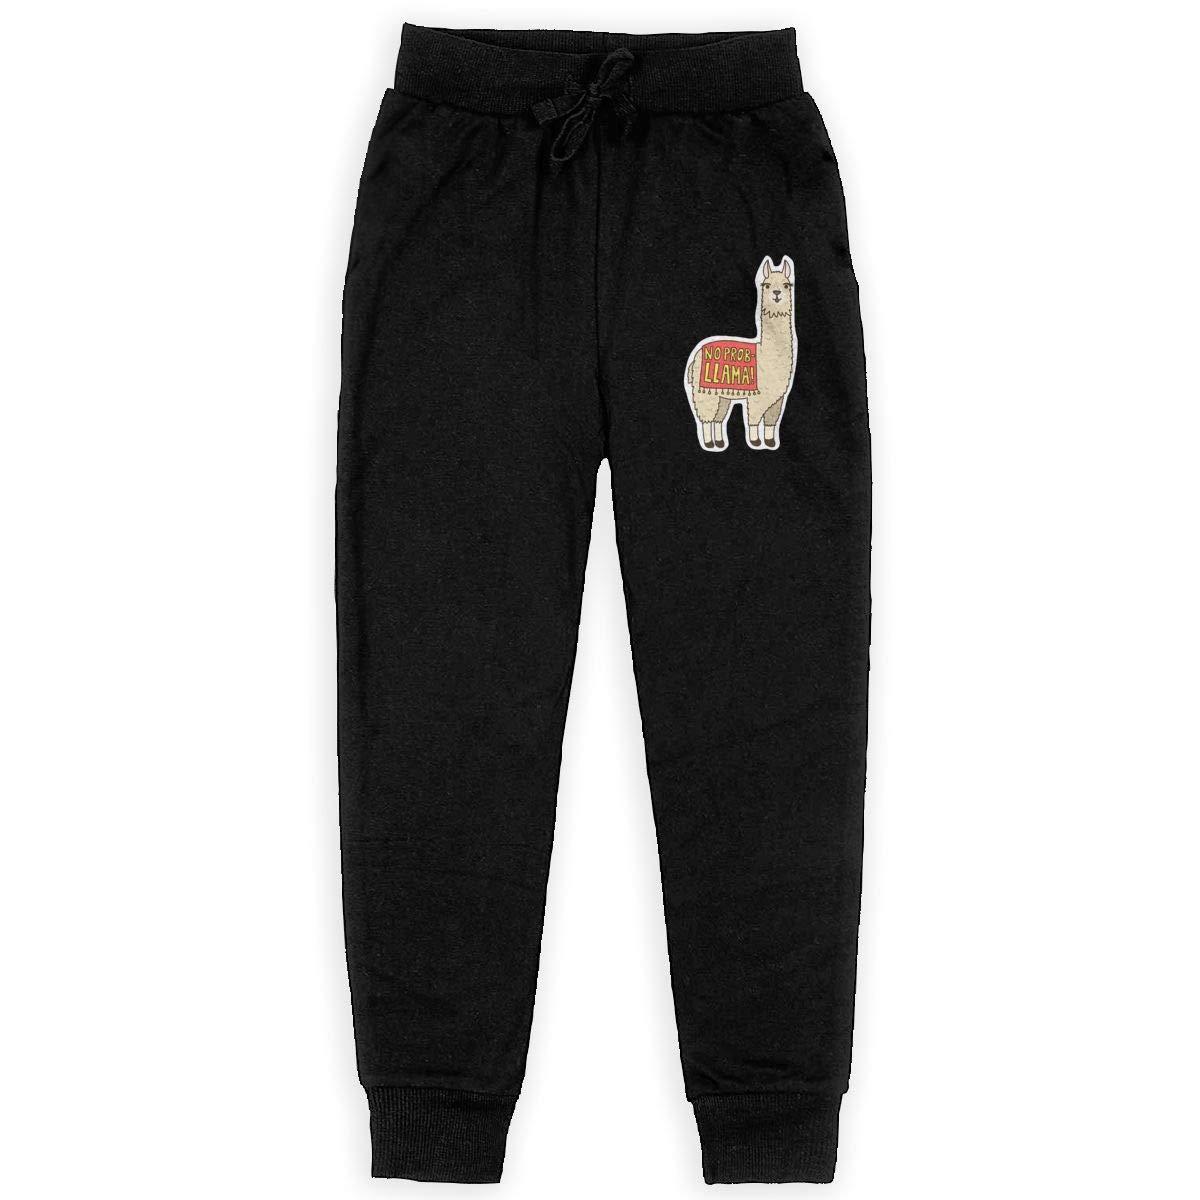 No Prob Llama Logo Boys Sweatpants,Joggers Sport Training Pants Trousers Black